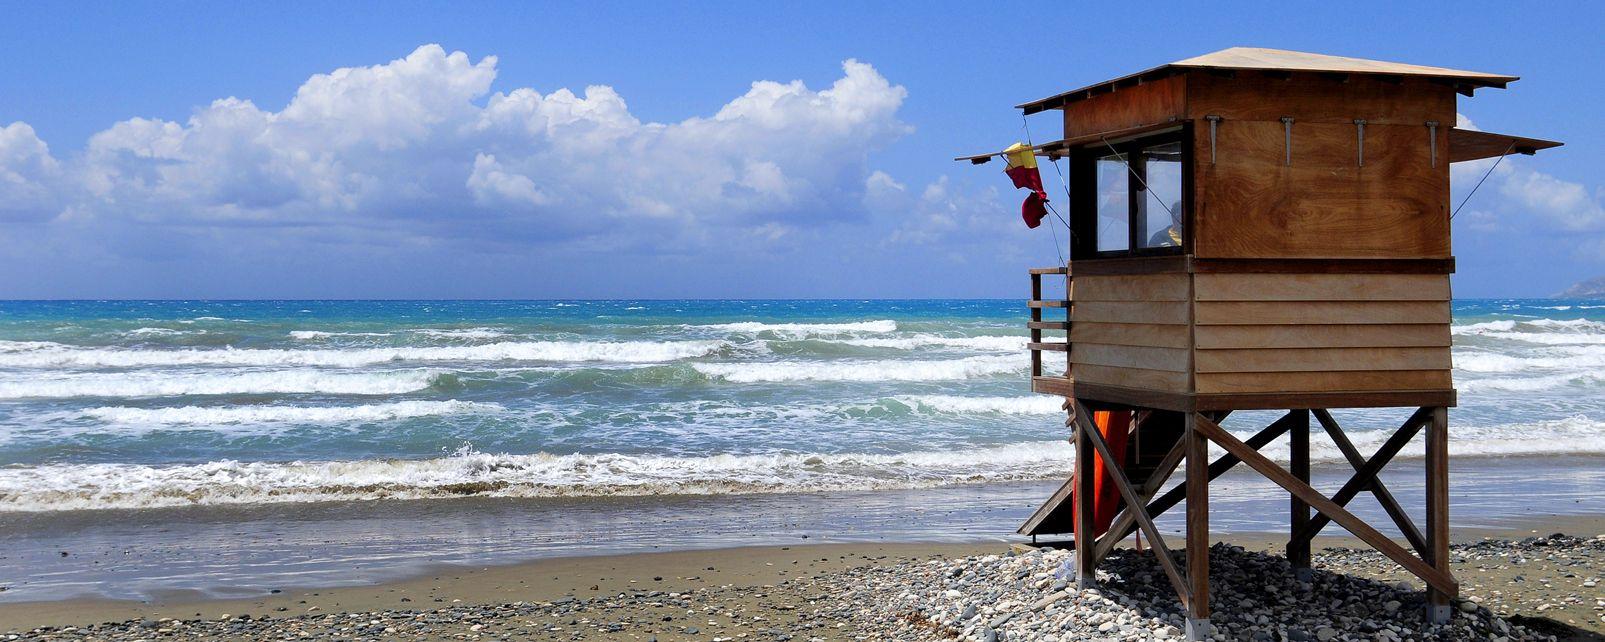 La baie d'Akrotiri , Les plages de la baie d'Akrotiri , Chypre